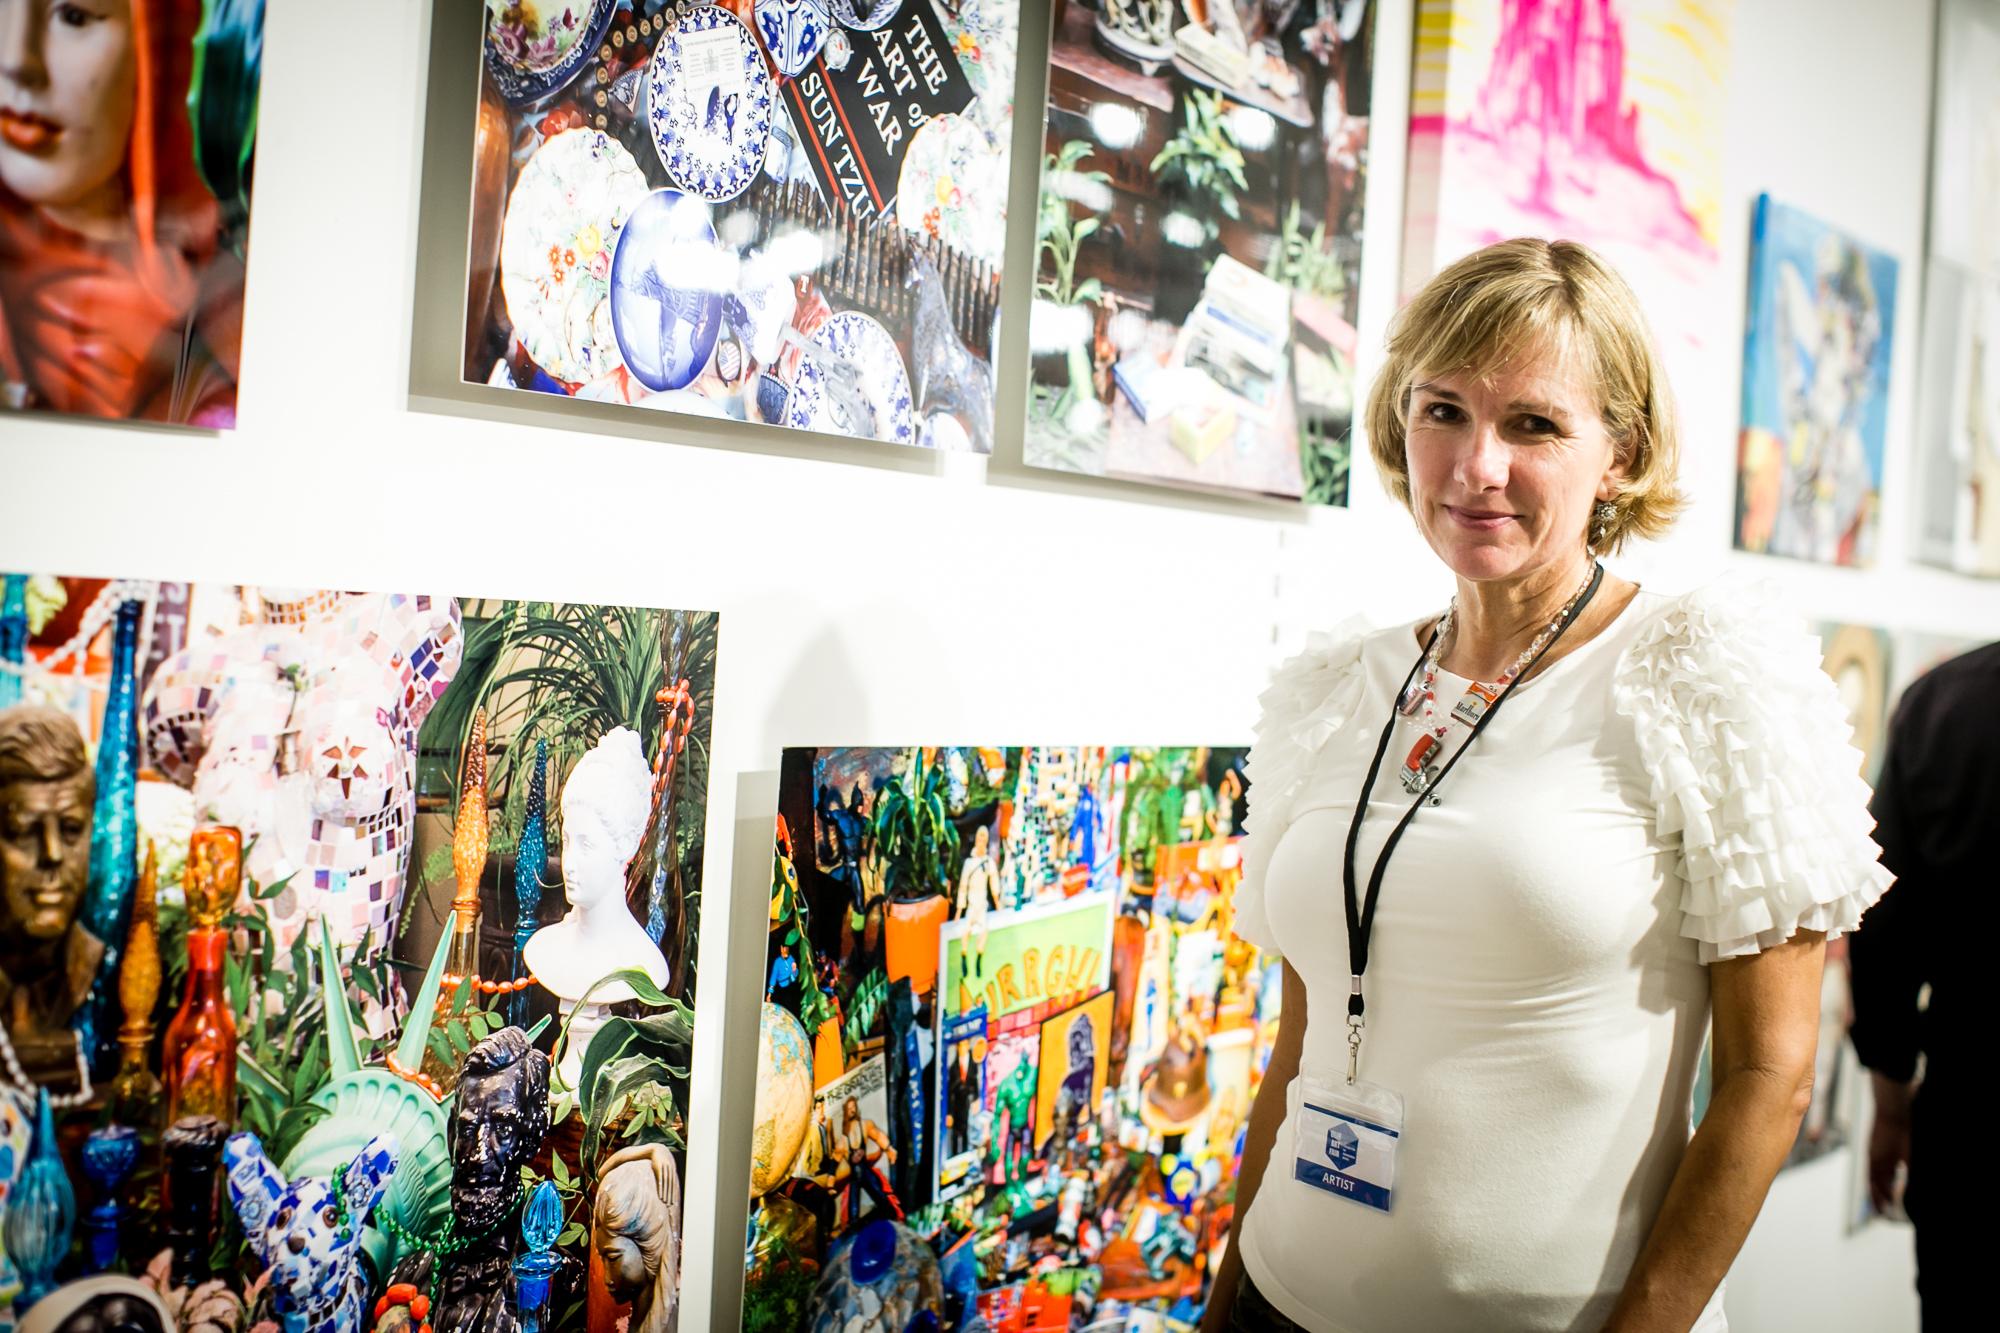 Artist Elizabeth Healey